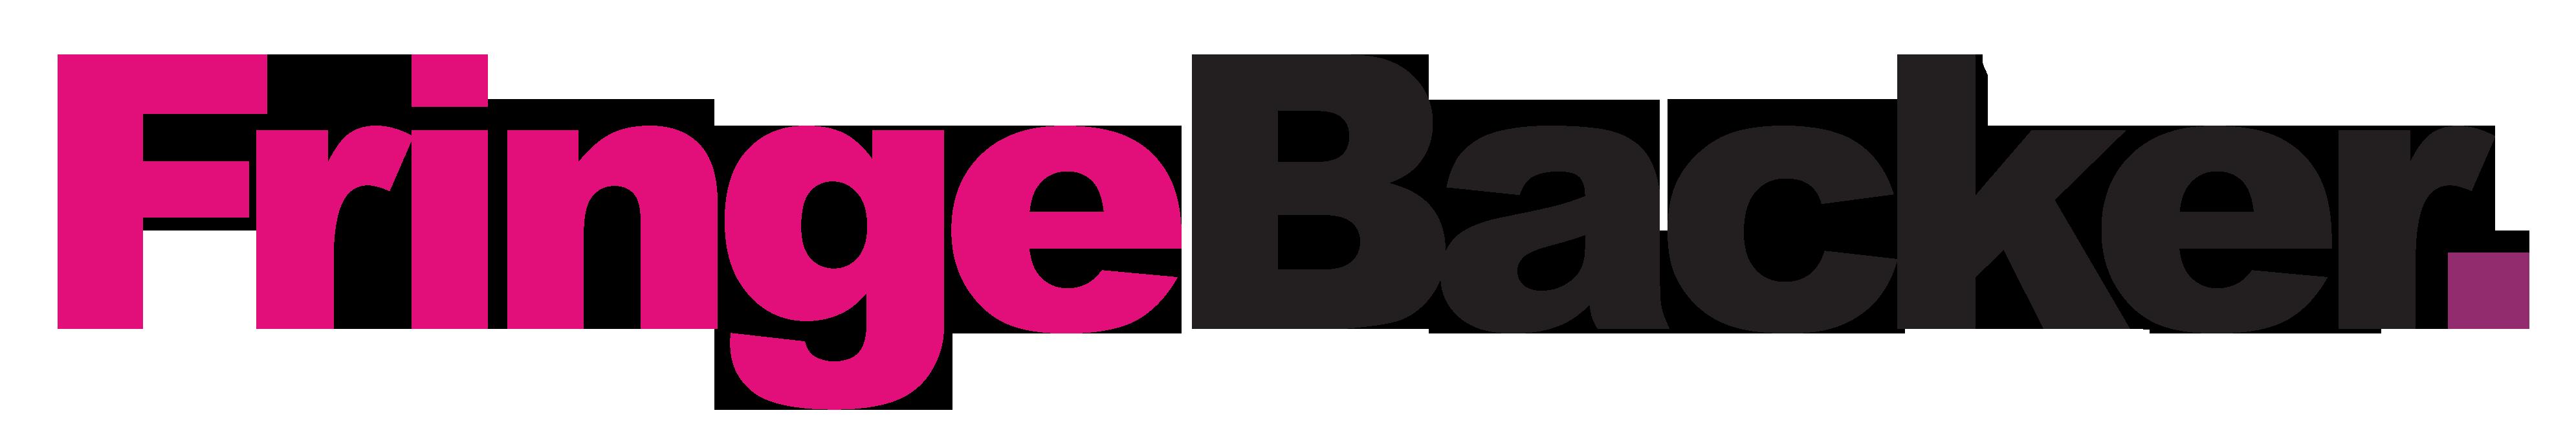 FringeBacker Logo